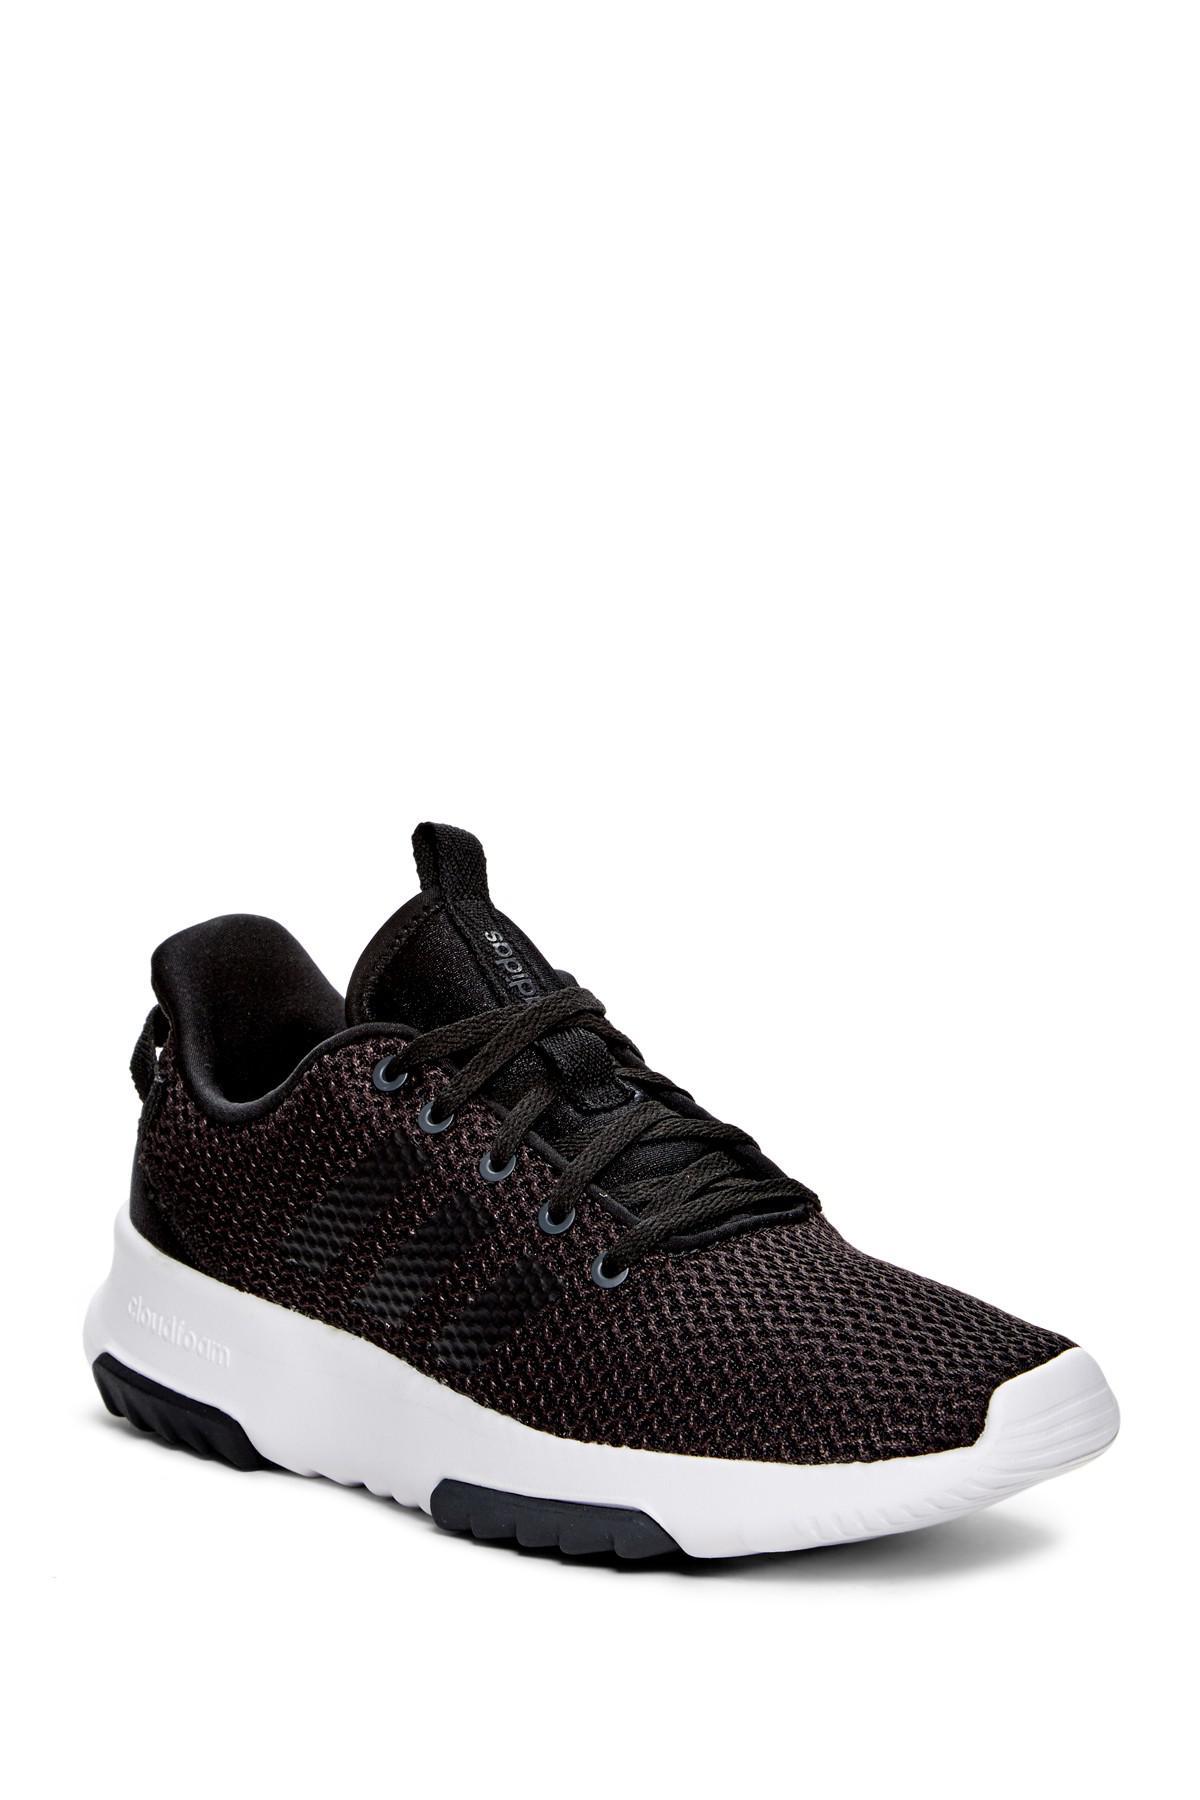 adidas cloudfoam racer tr scarpe da ginnastica in nero per gli uomini lyst